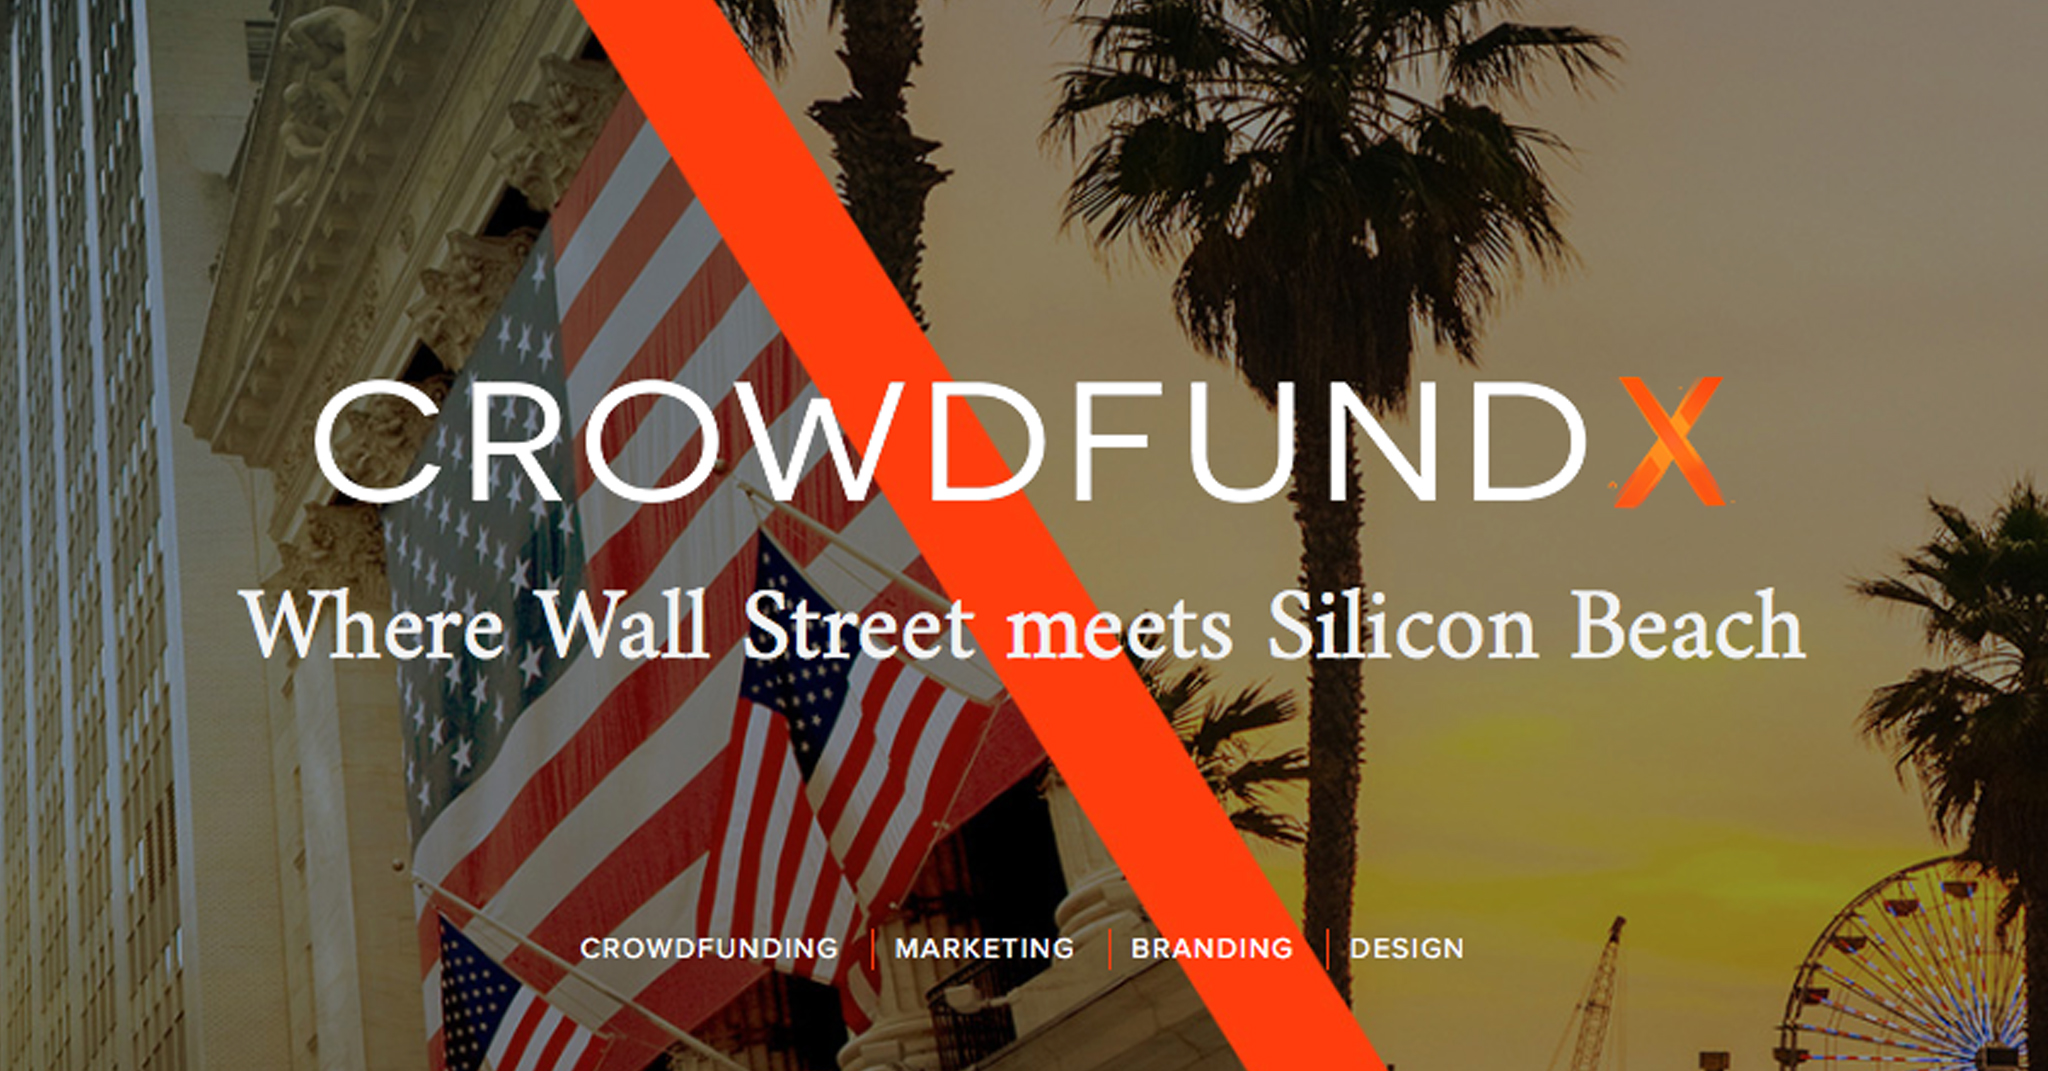 crowdfundx.jpg